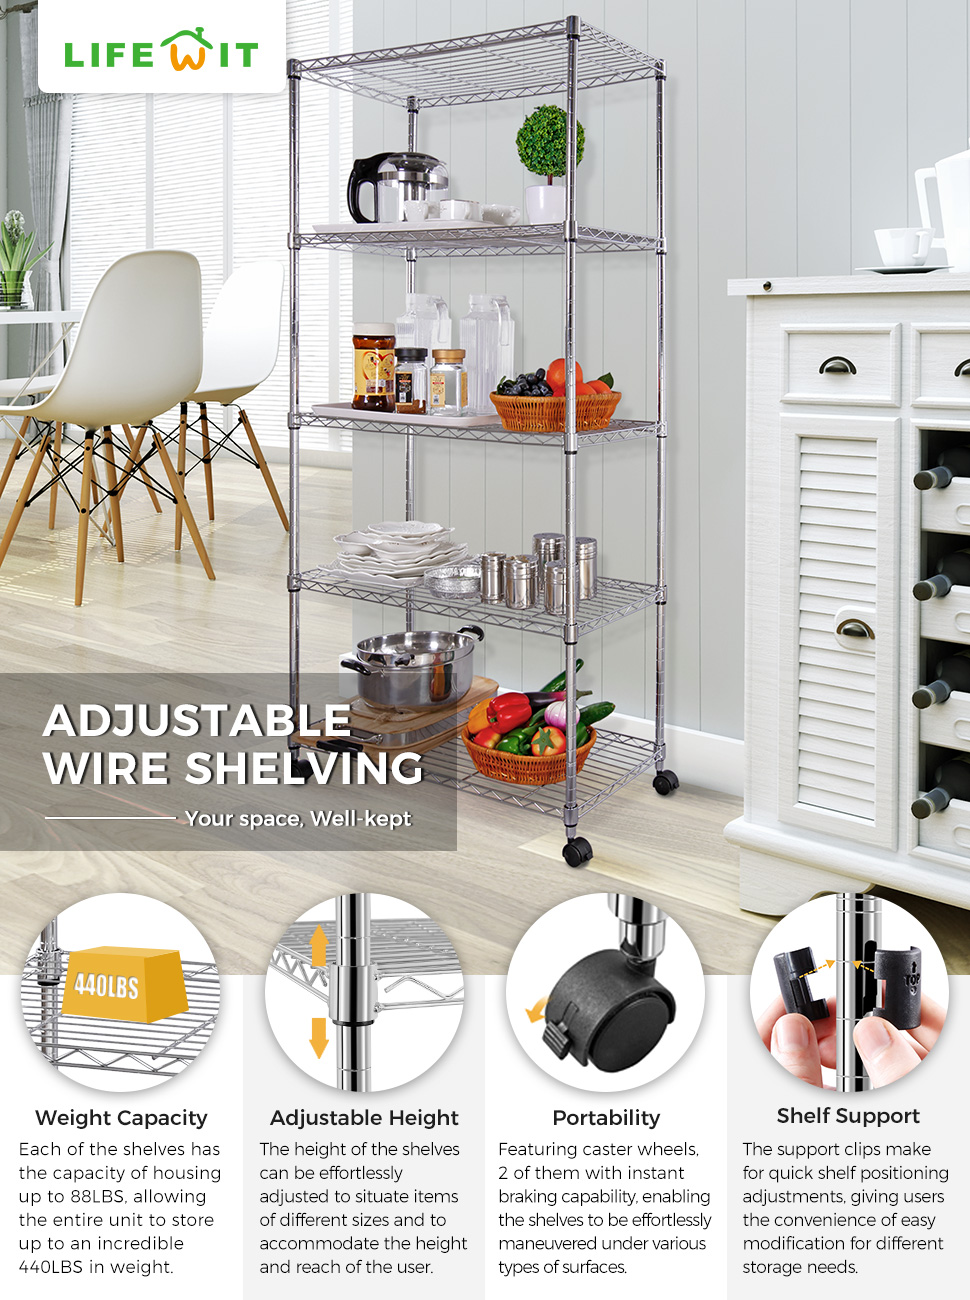 Amazon.com: Lifewit Wire Shelving (Storage Rack): Home & Kitchen